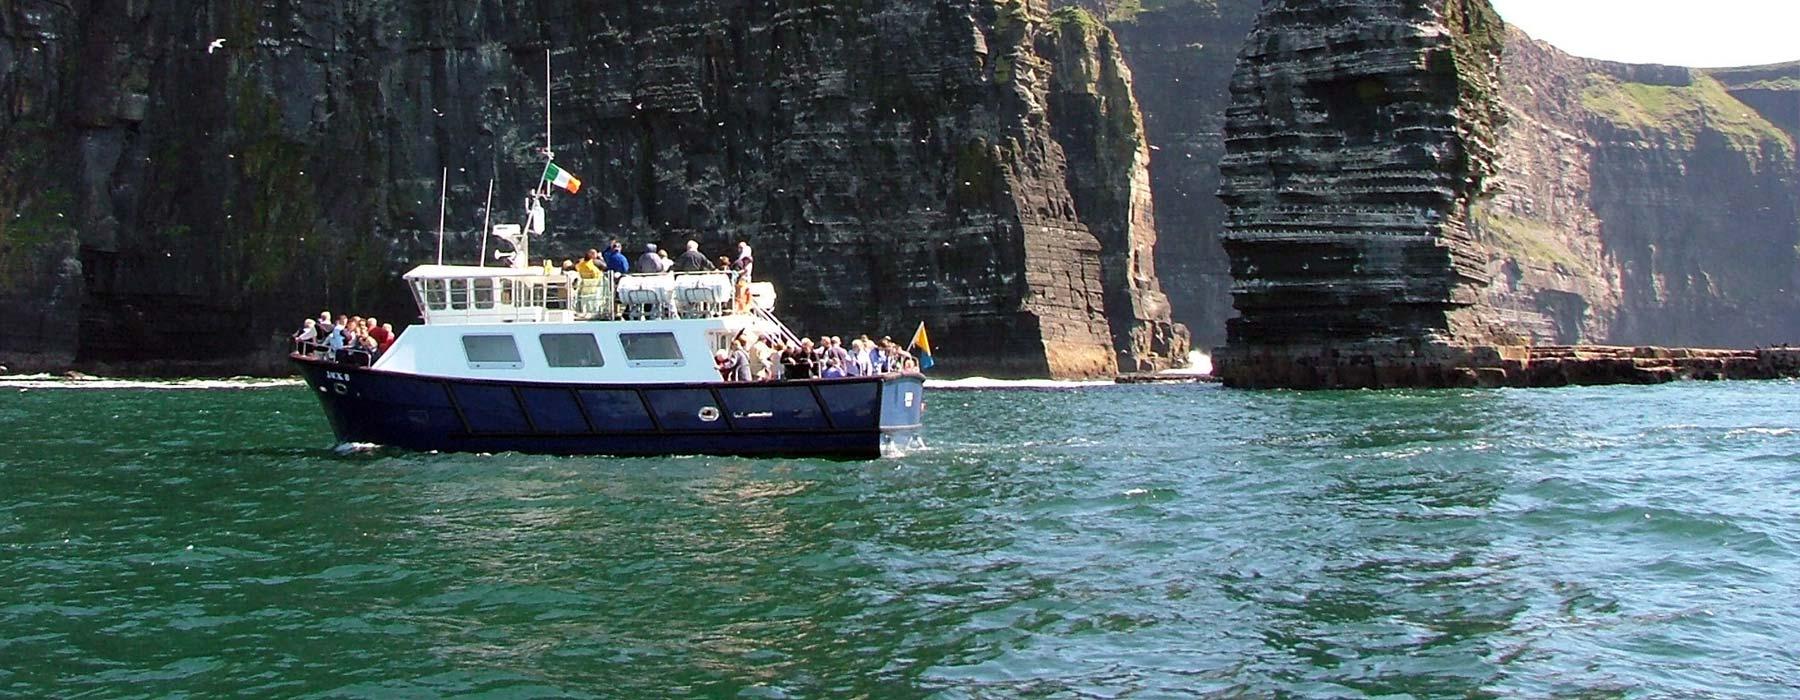 Ireland Cliffs Of Moher Day Tour